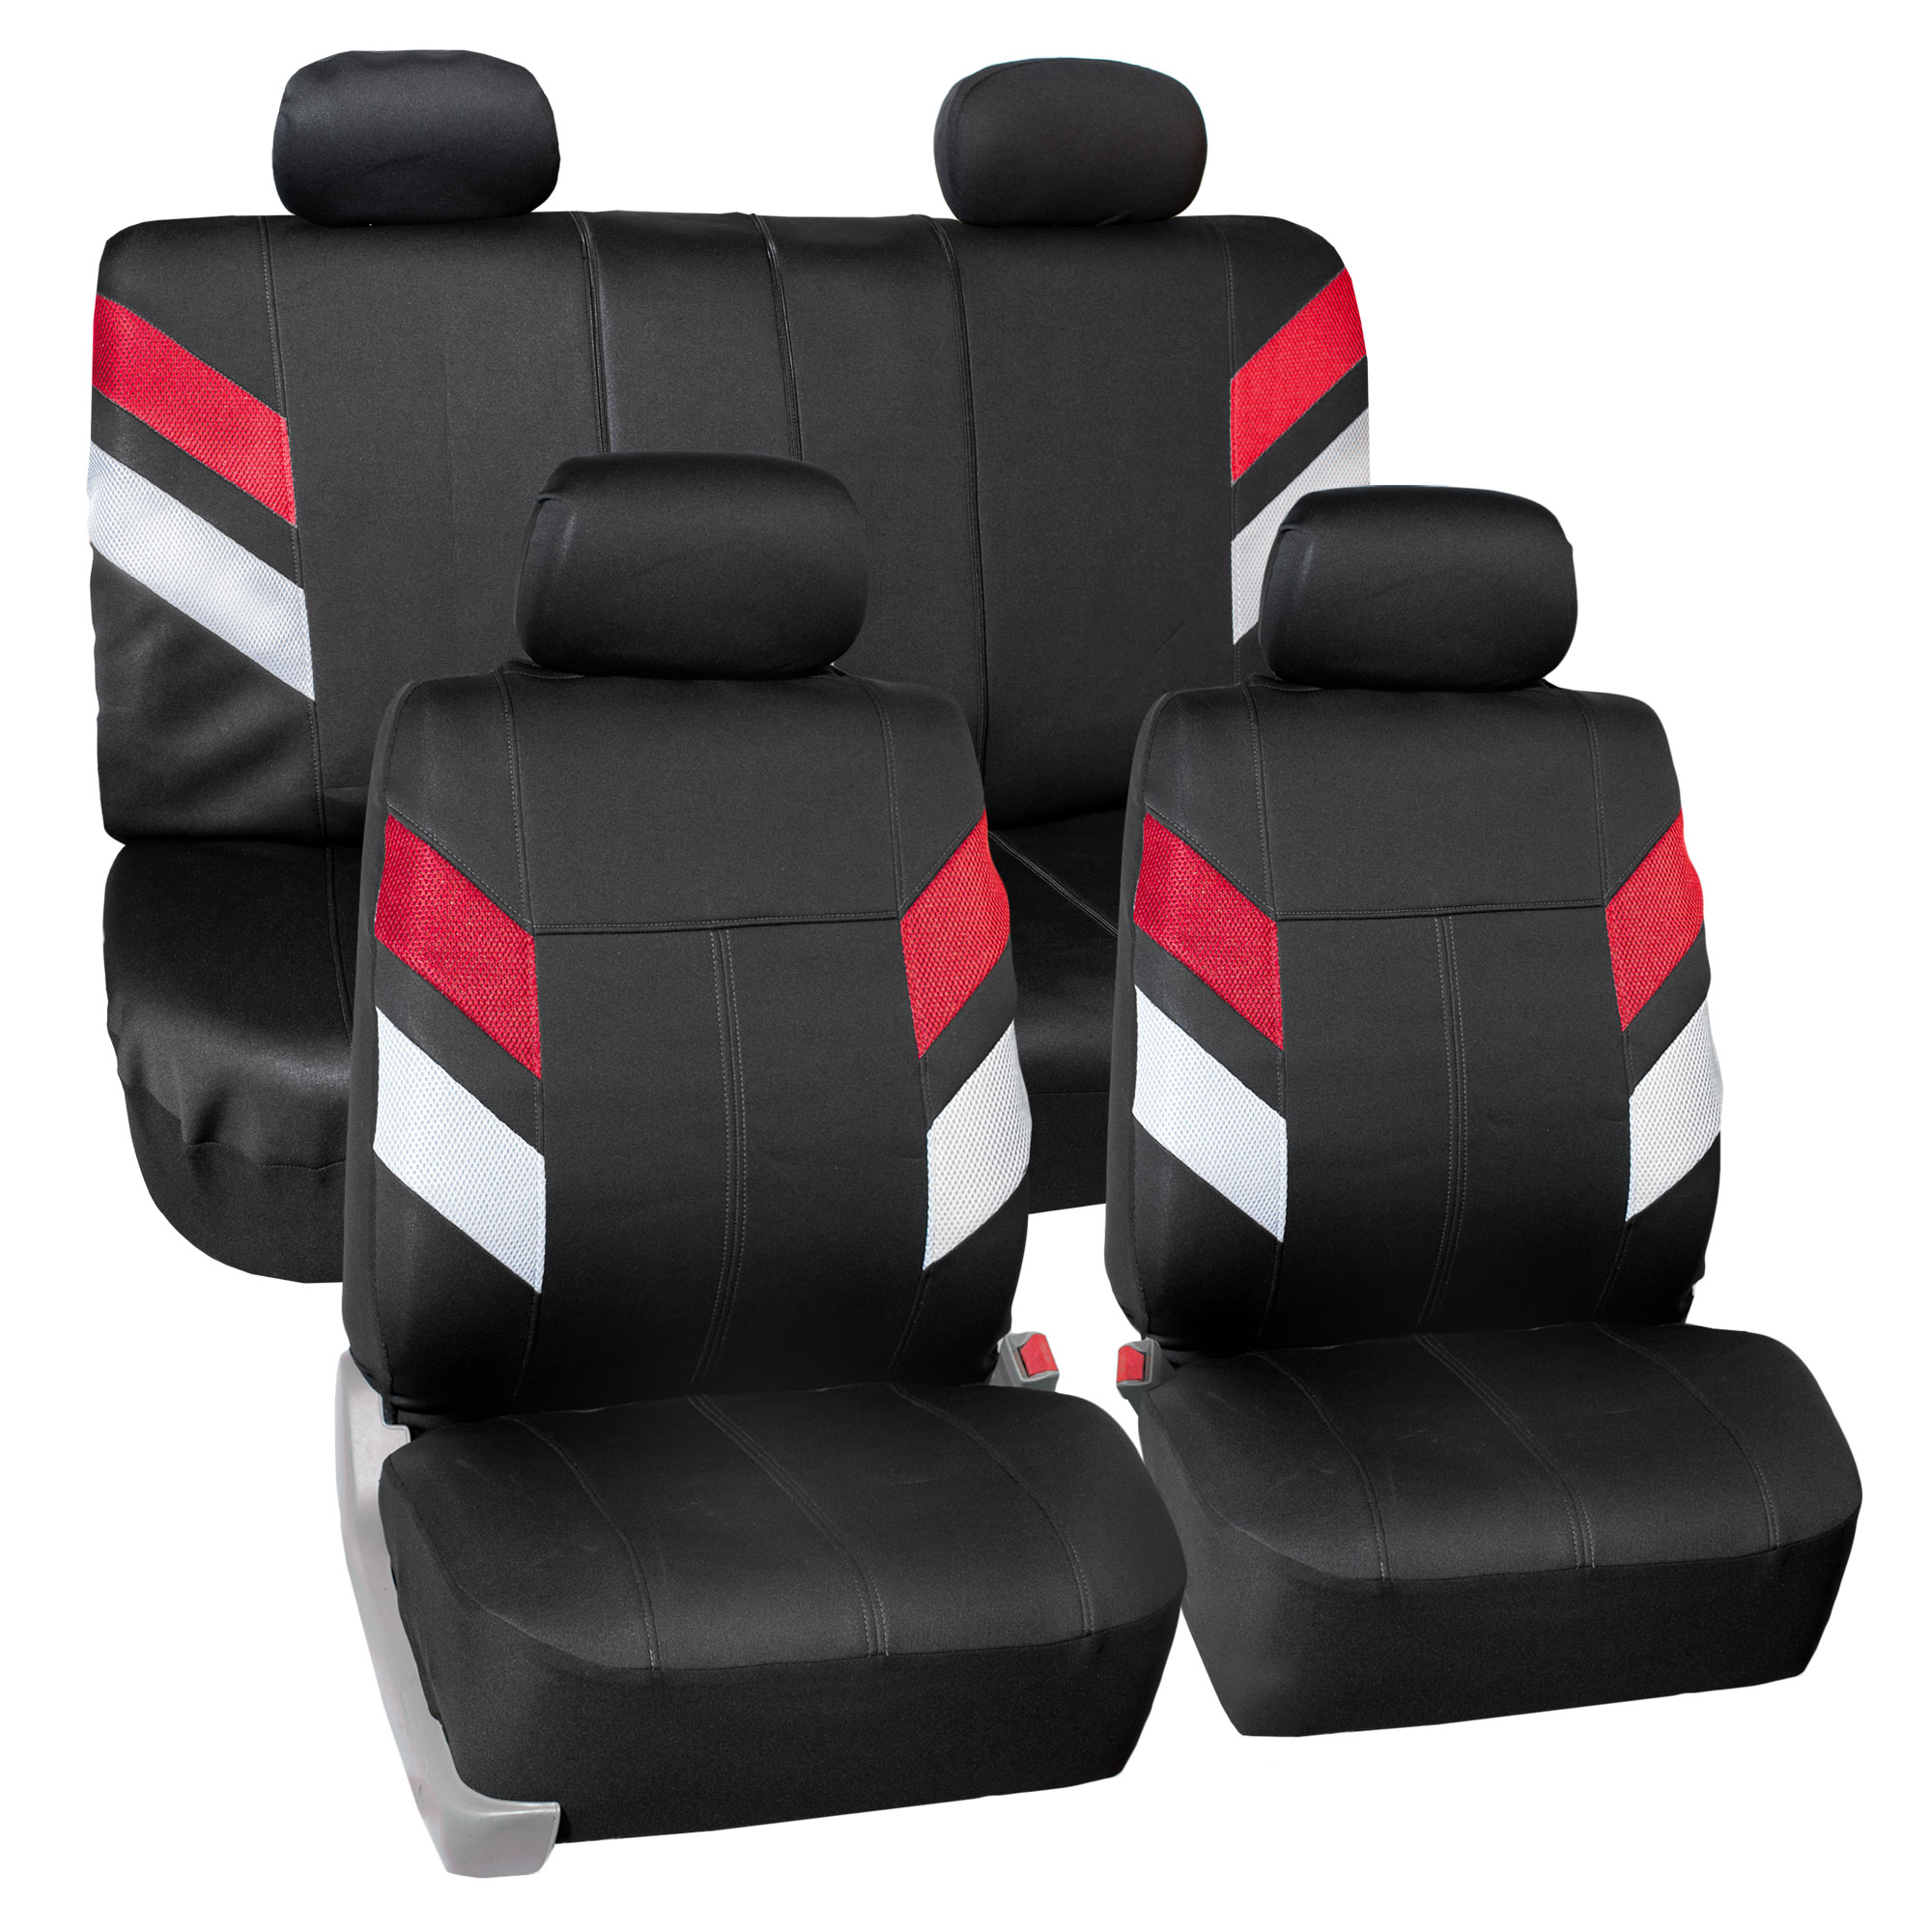 Neoprene Car Seat Covers For Auto Car SUV Van 4 Headrest